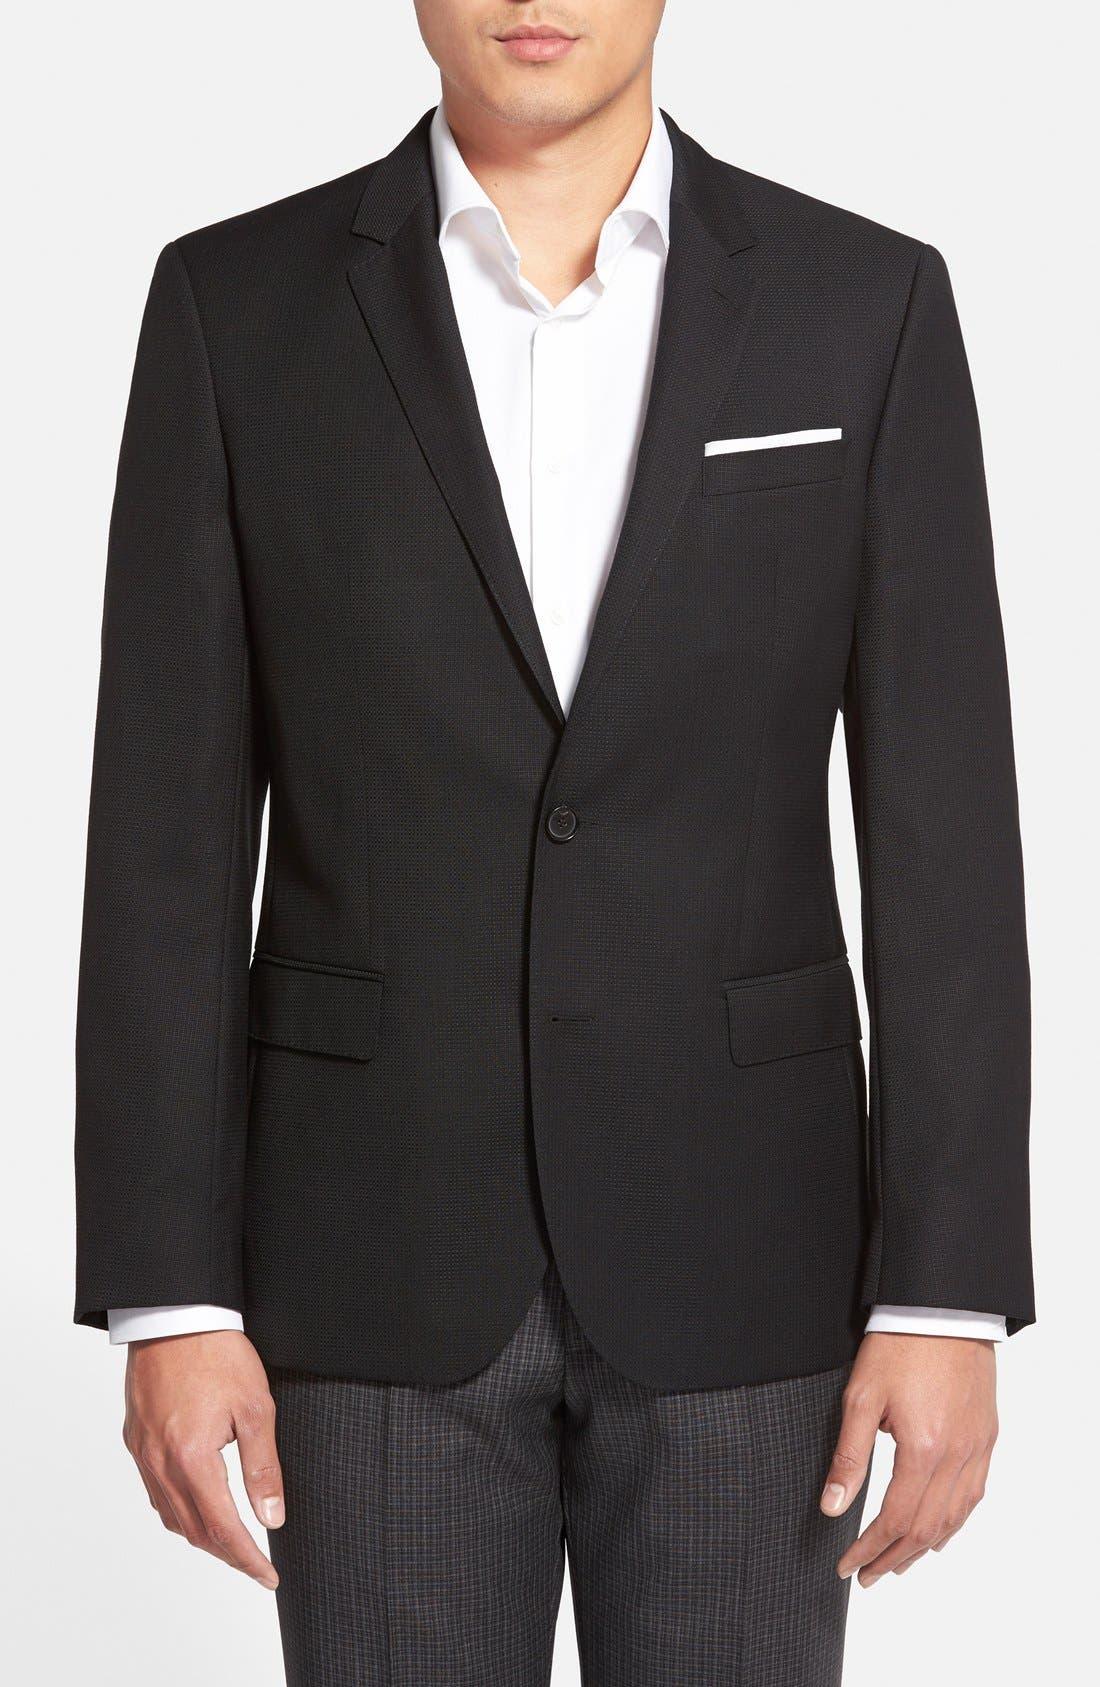 Hutch Trim Fit Wool Blazer,                         Main,                         color, 001